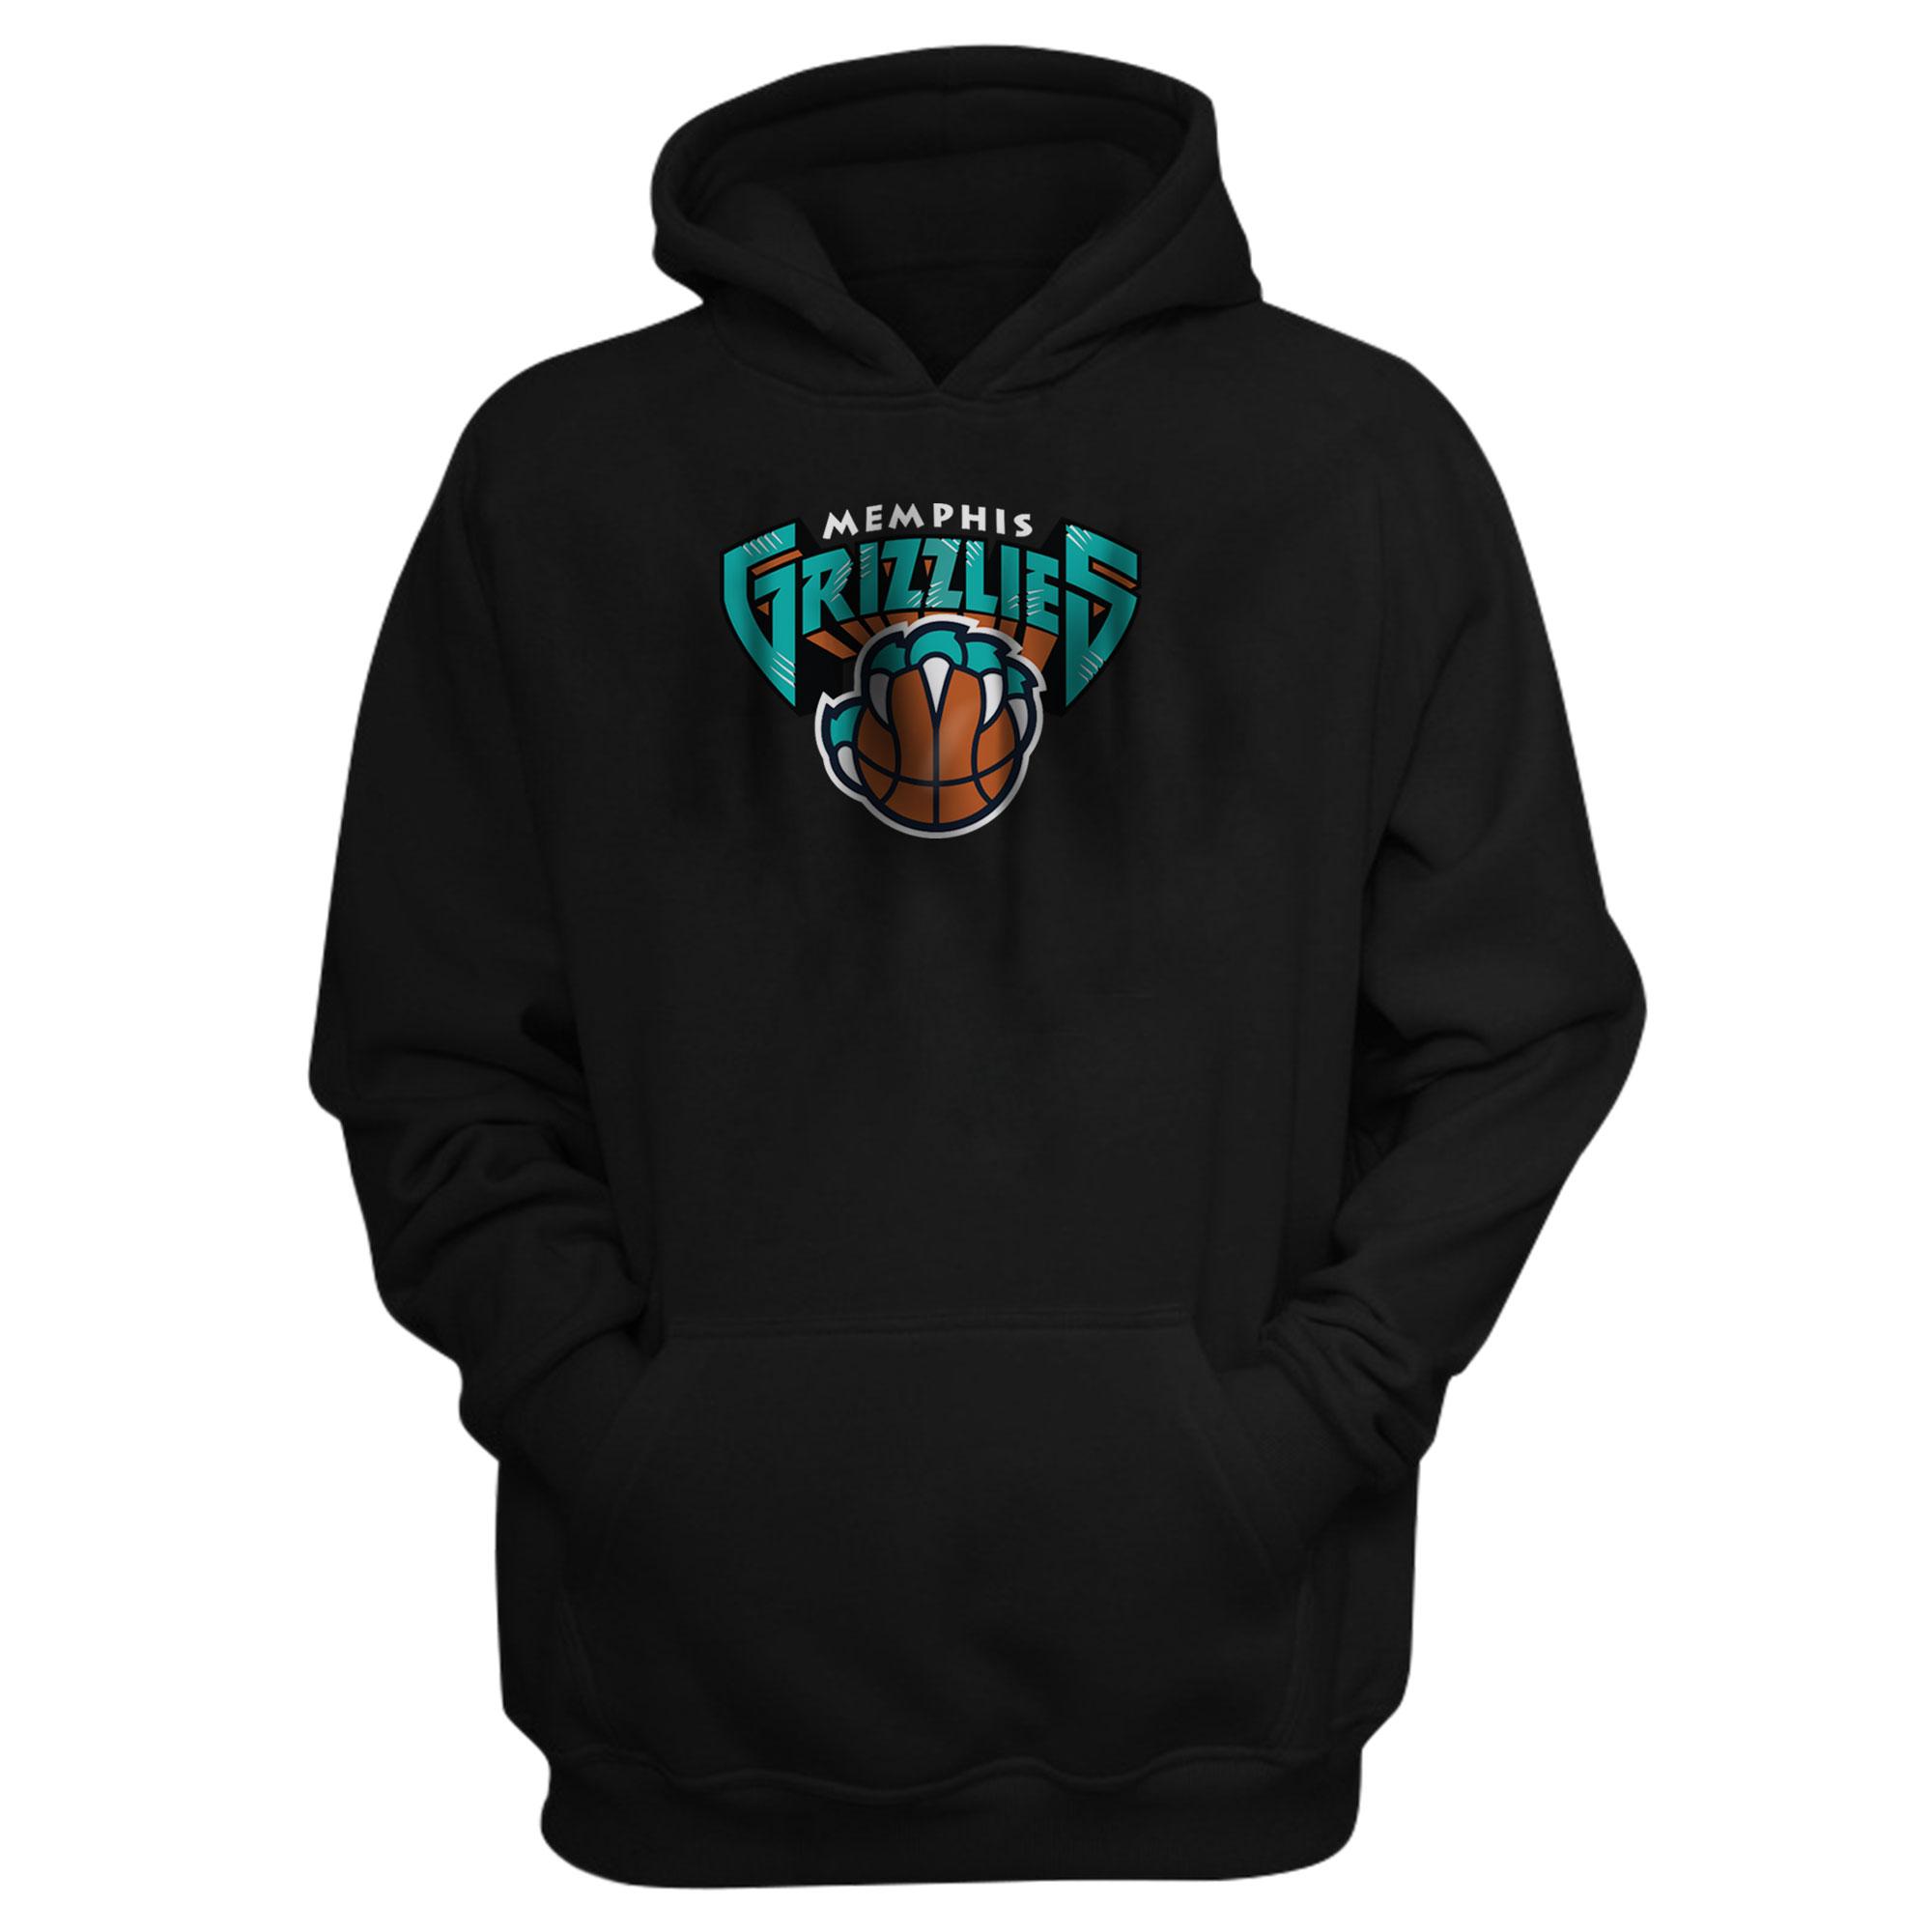 Memphis Grizzlies Hoodie (HD-BLU-493-NBA-MEMPHIS-GRZ)